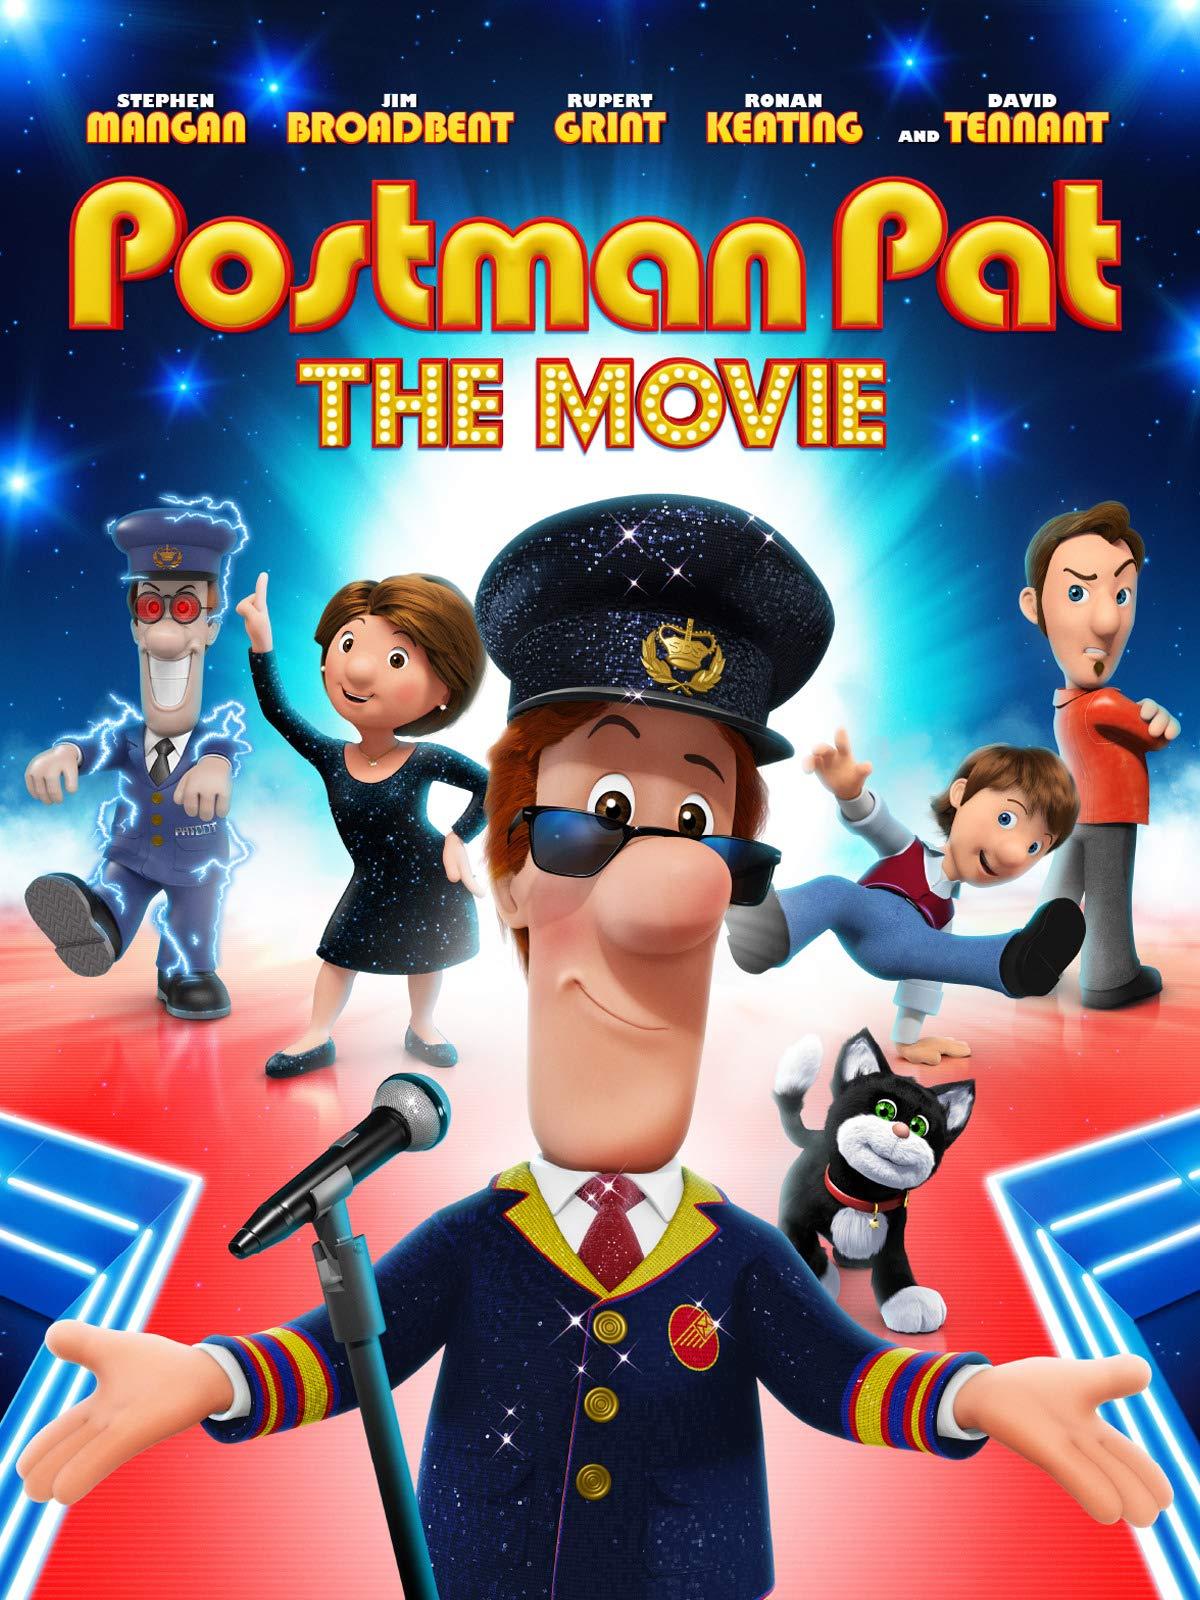 Postman Pat: The Movie on Amazon Prime Video UK